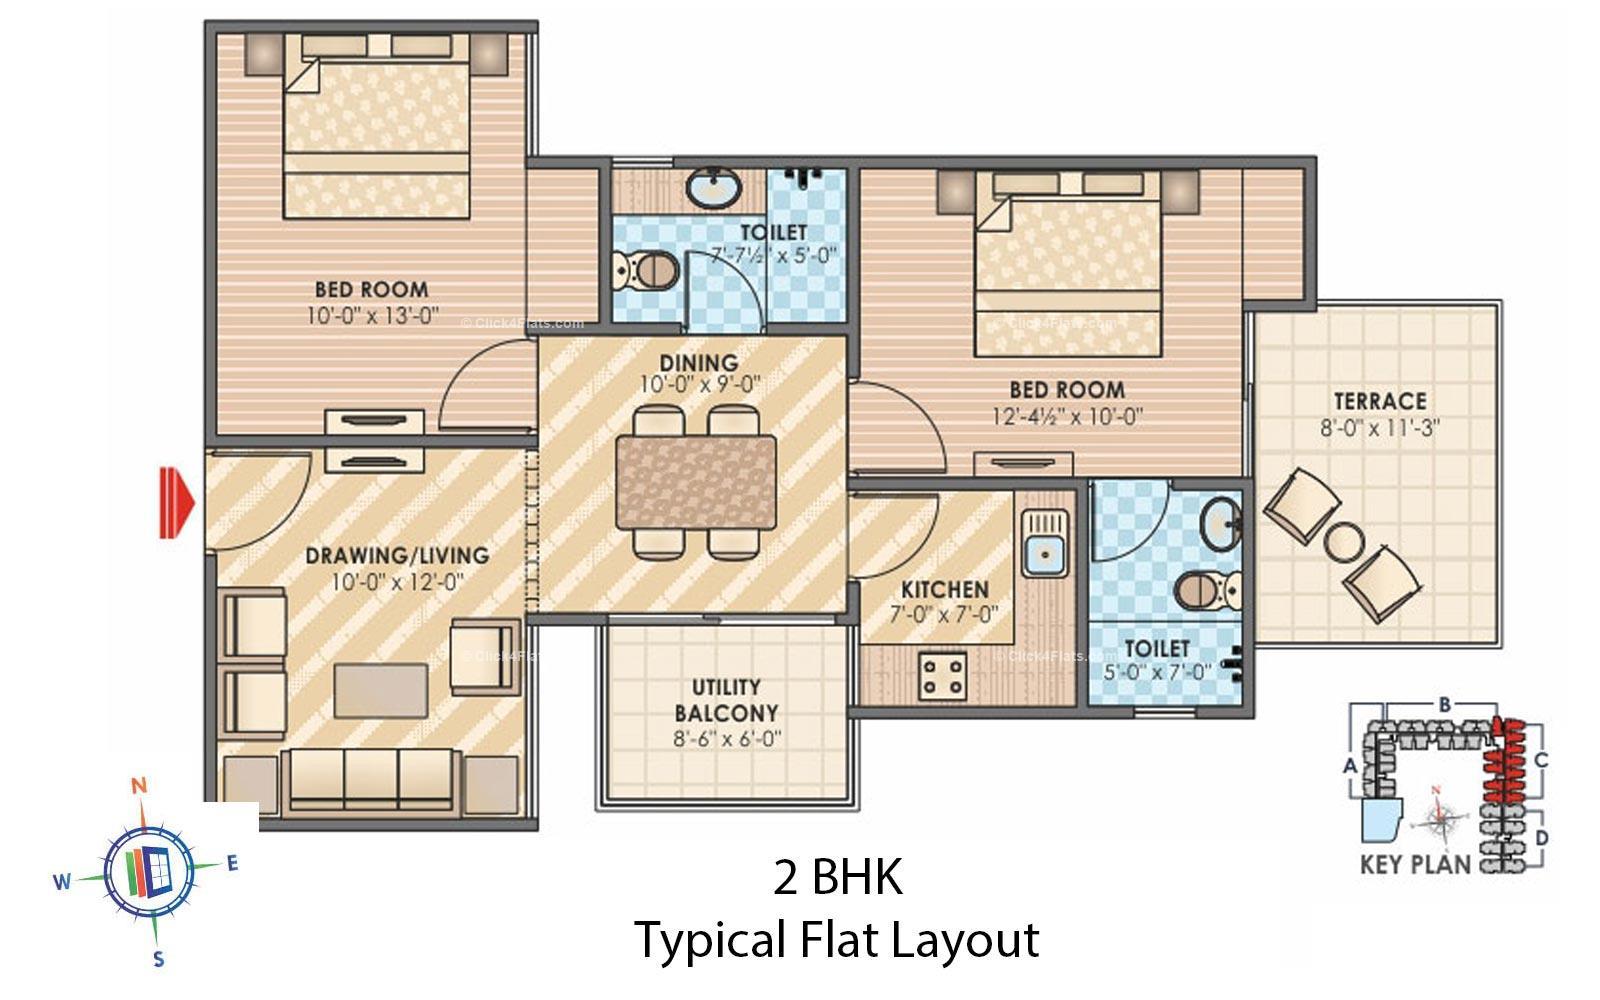 Anukampa Platina Terraces Flats For Sale In Anukampa Platina Terraces At Patrakar Colony By Anukampa Group Click4flats Com